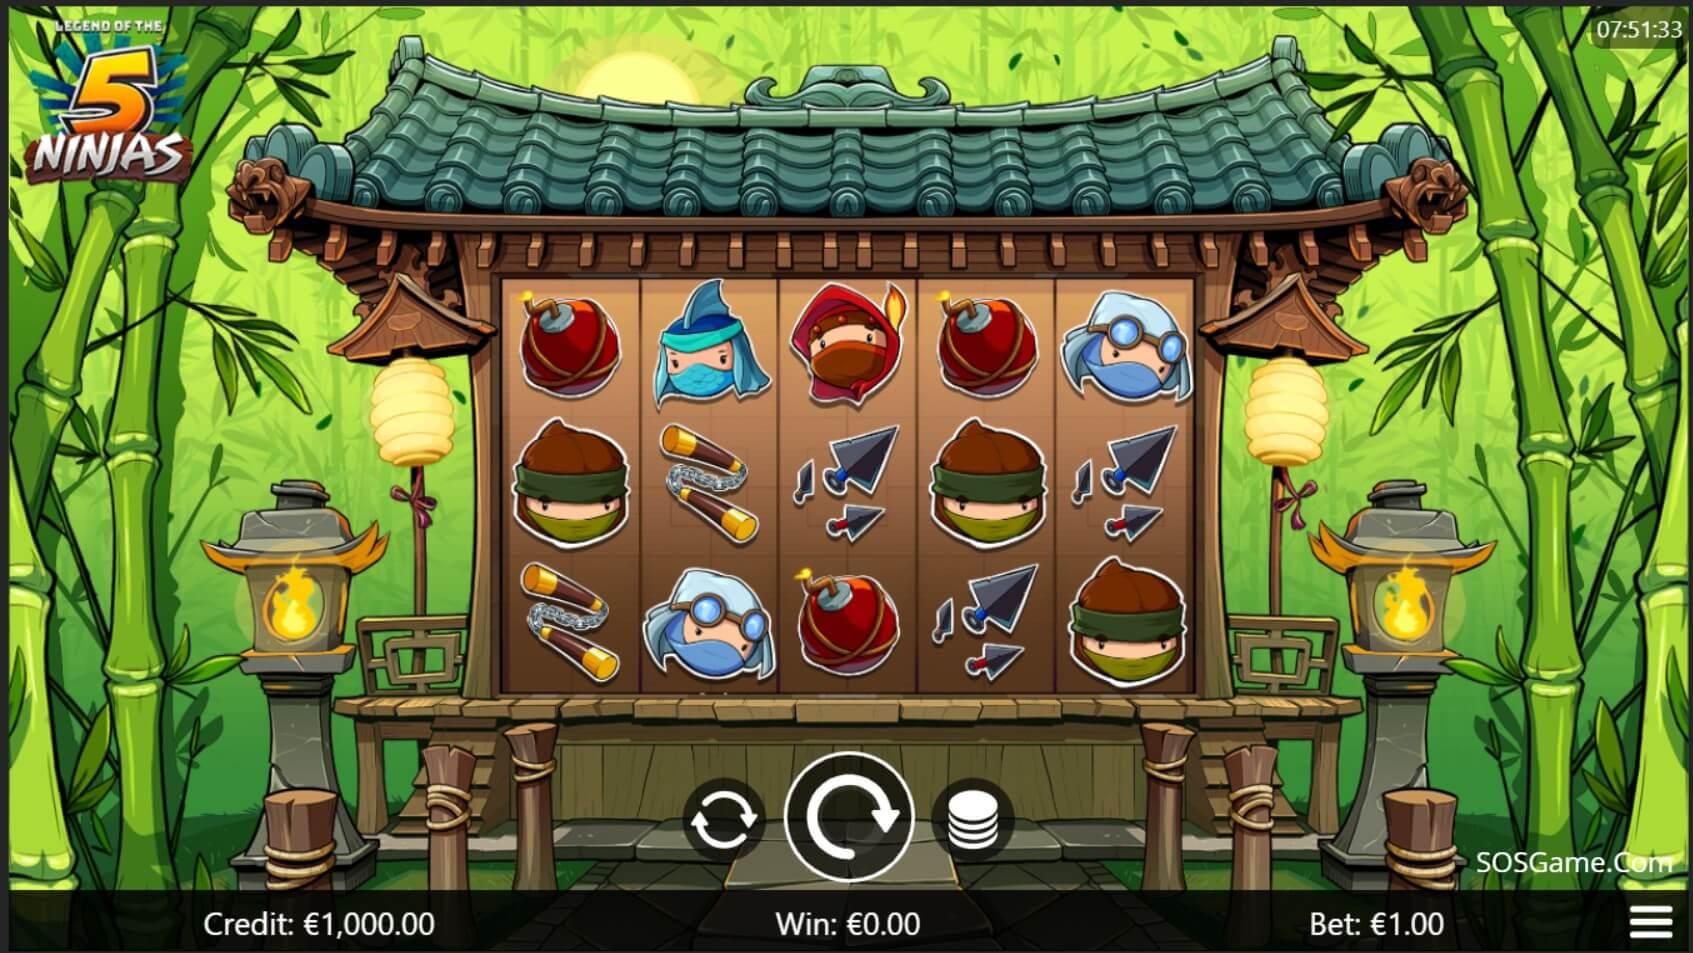 5 Ninjas Slot Gameplay